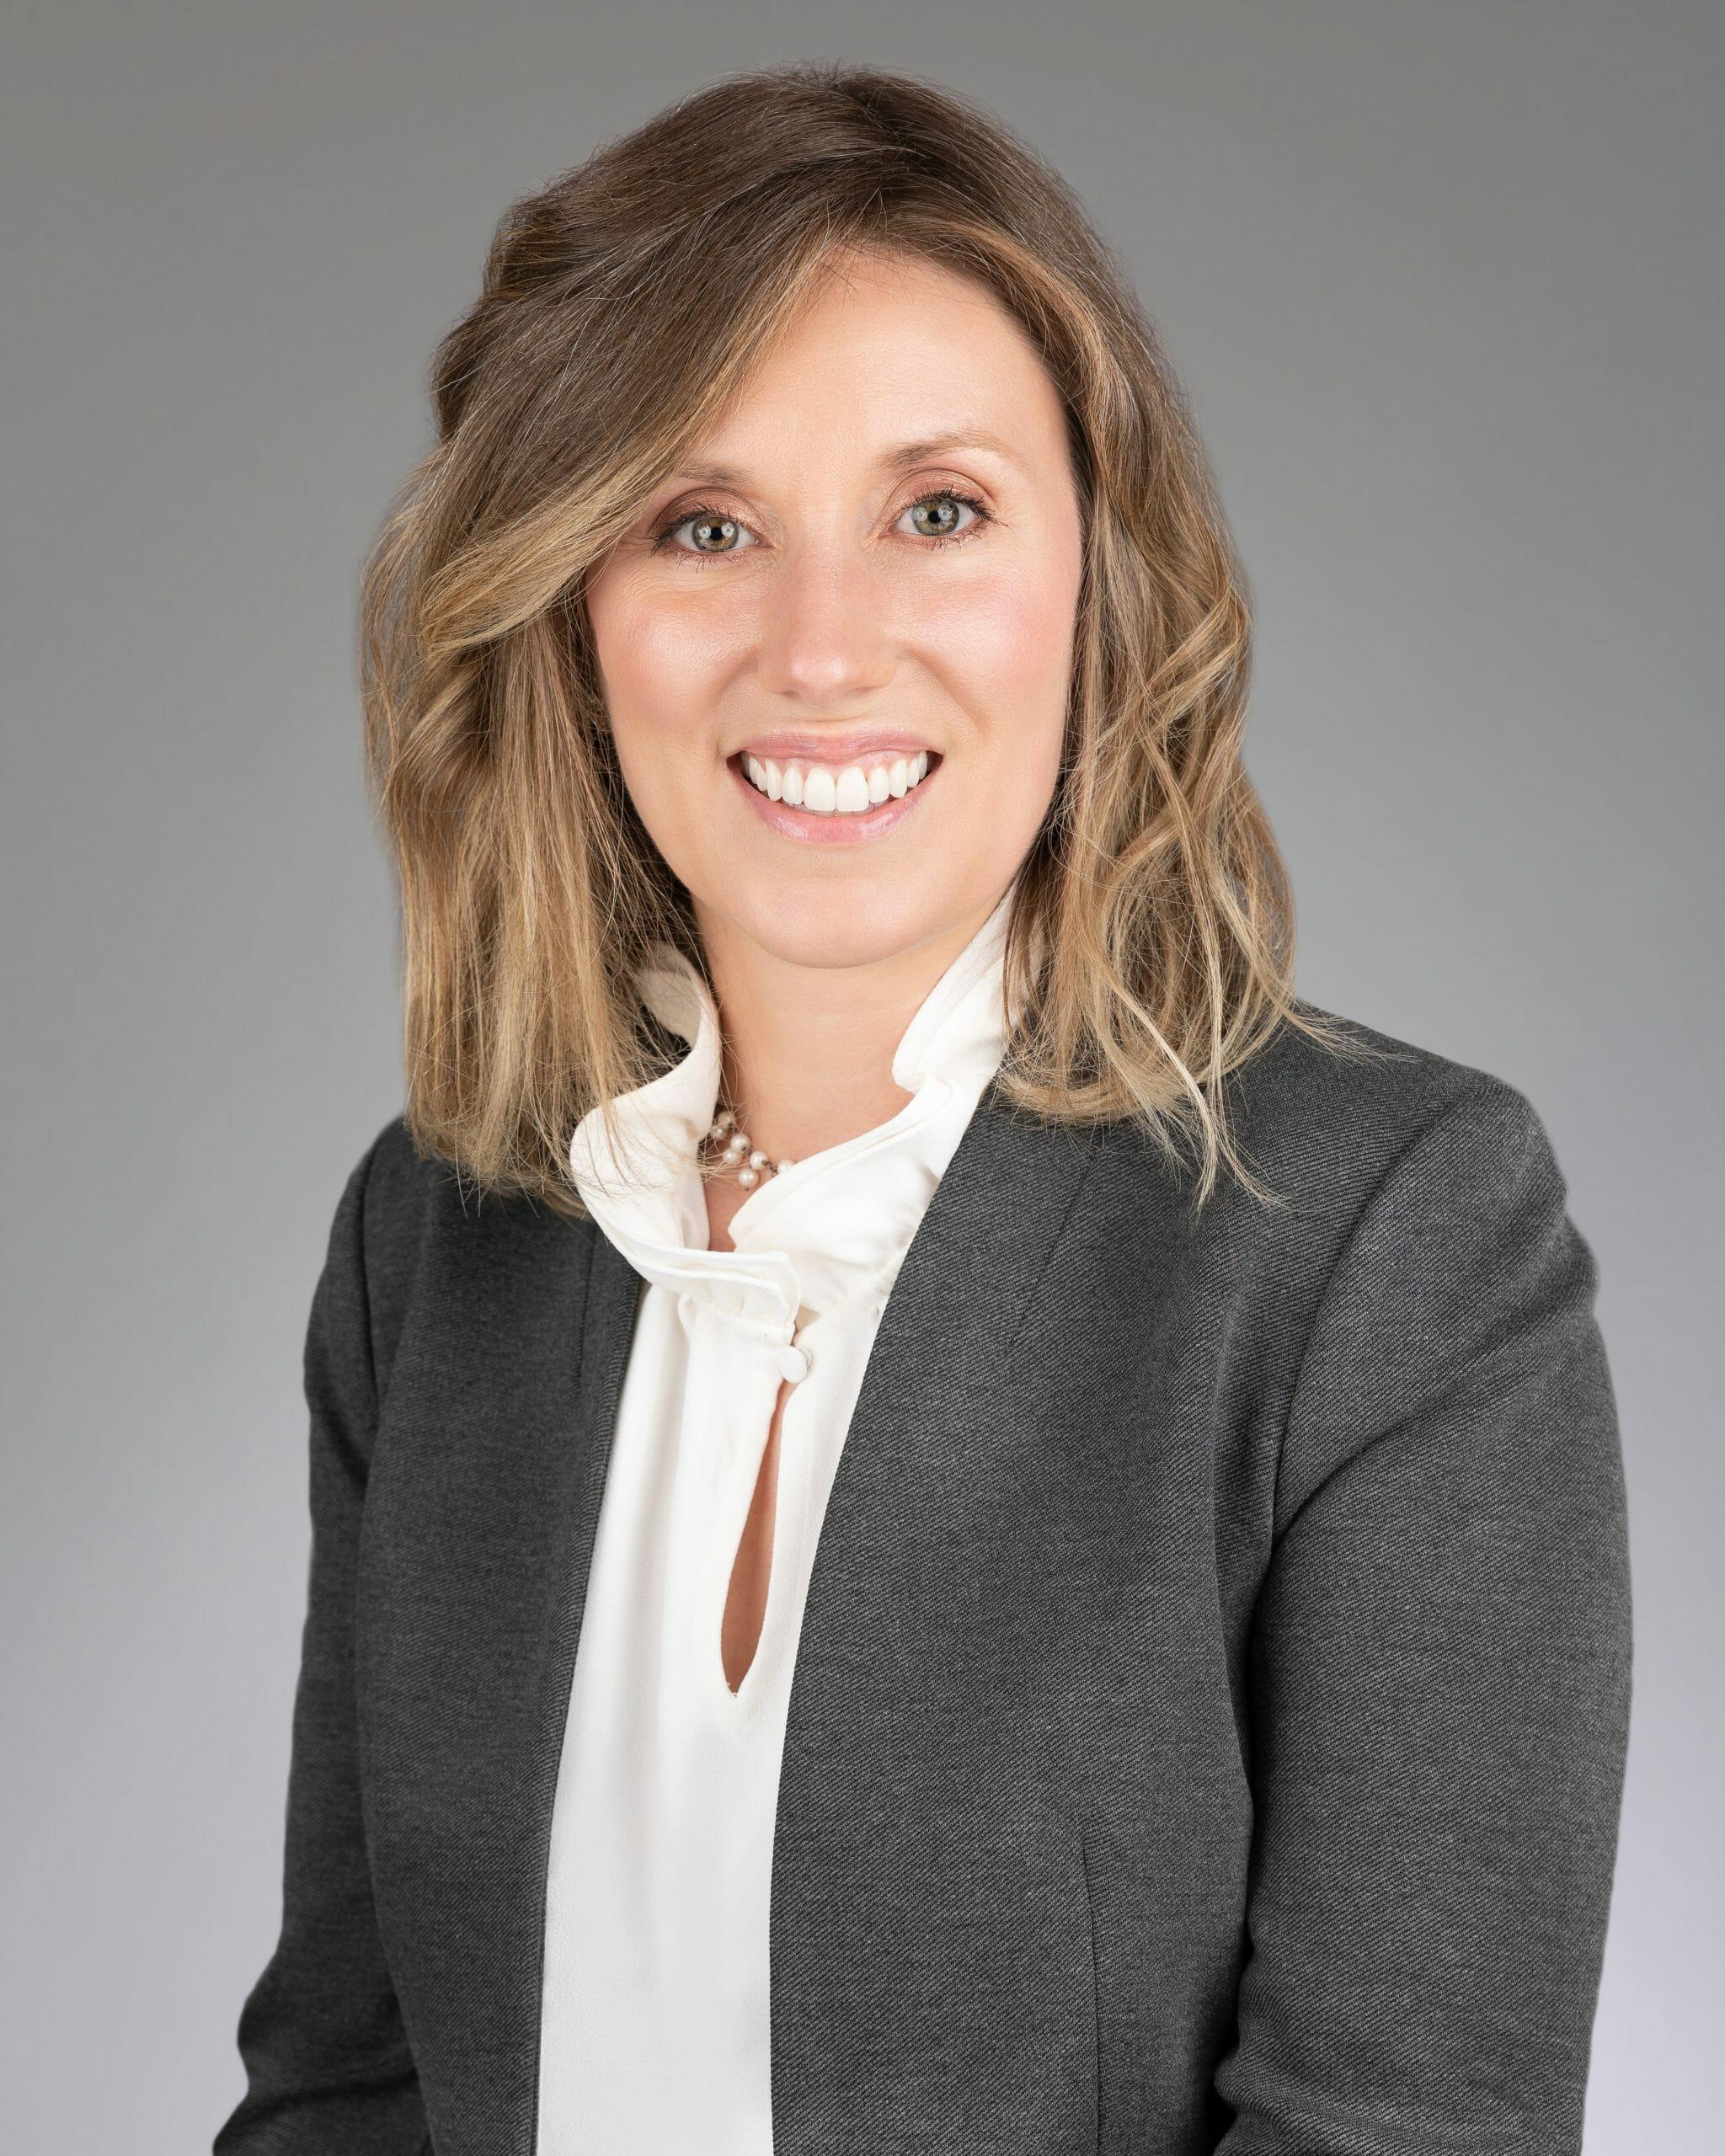 Megan Simank, JD, MBA, CTFA